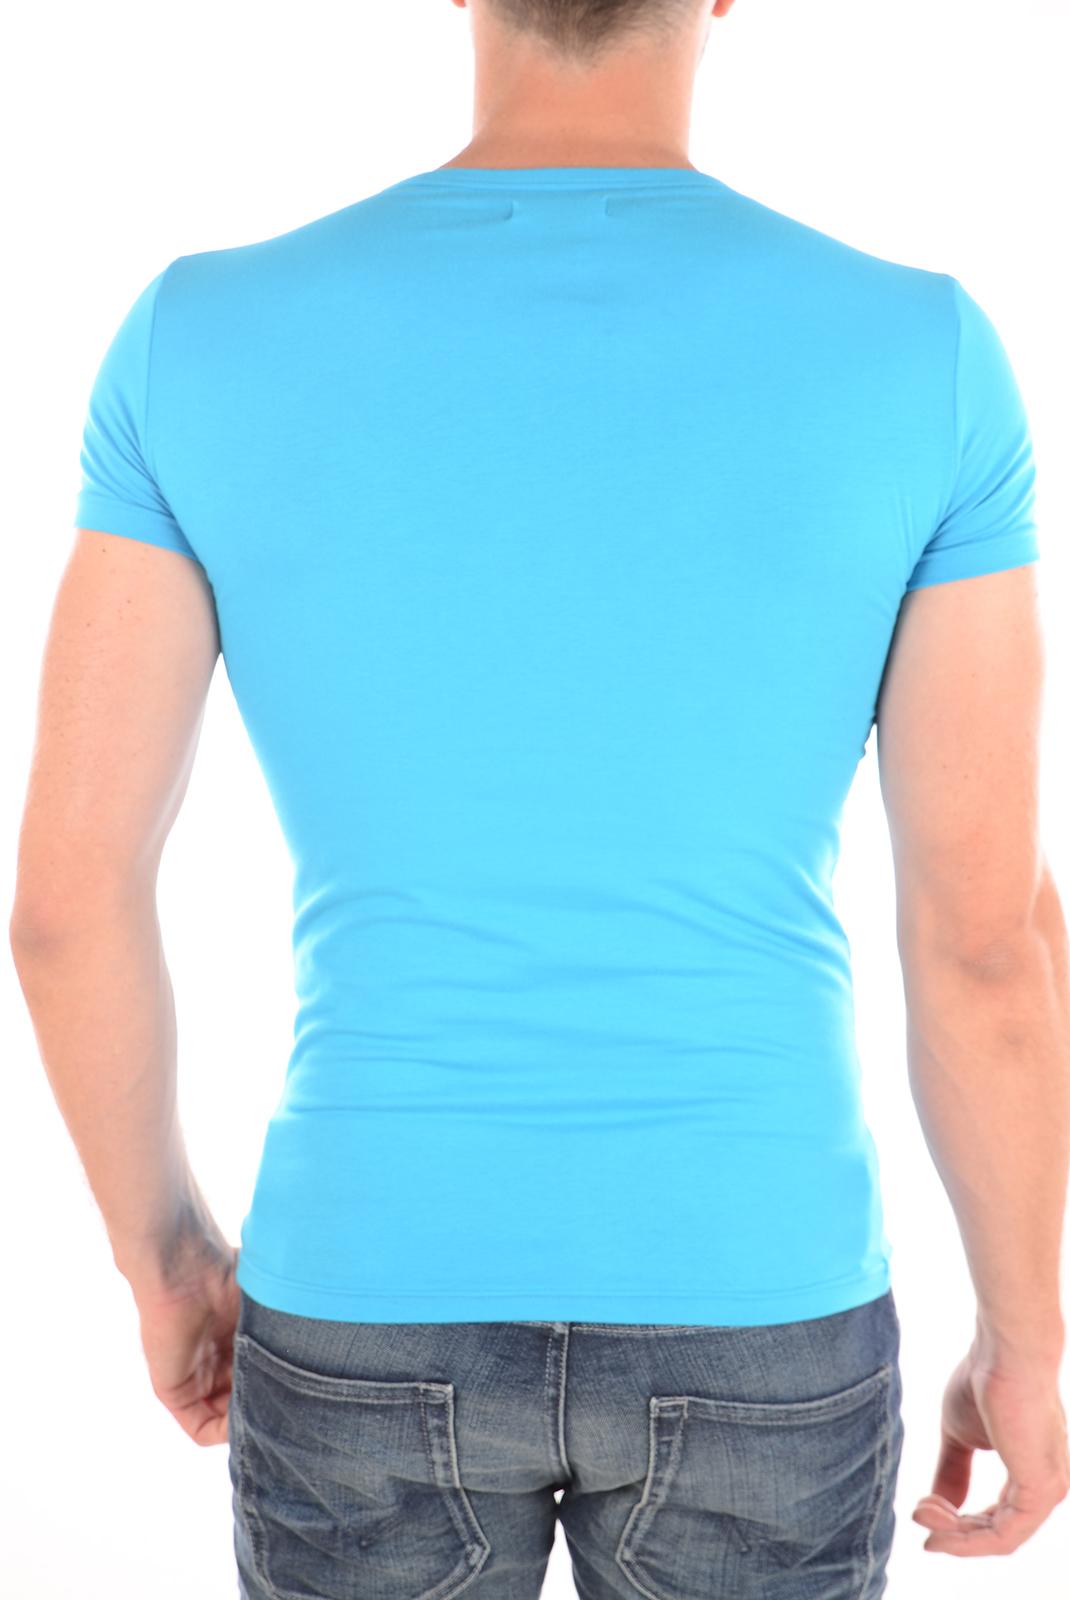 Tee-shirts  Emporio armani 111035 6P715 032 TURQUOISE